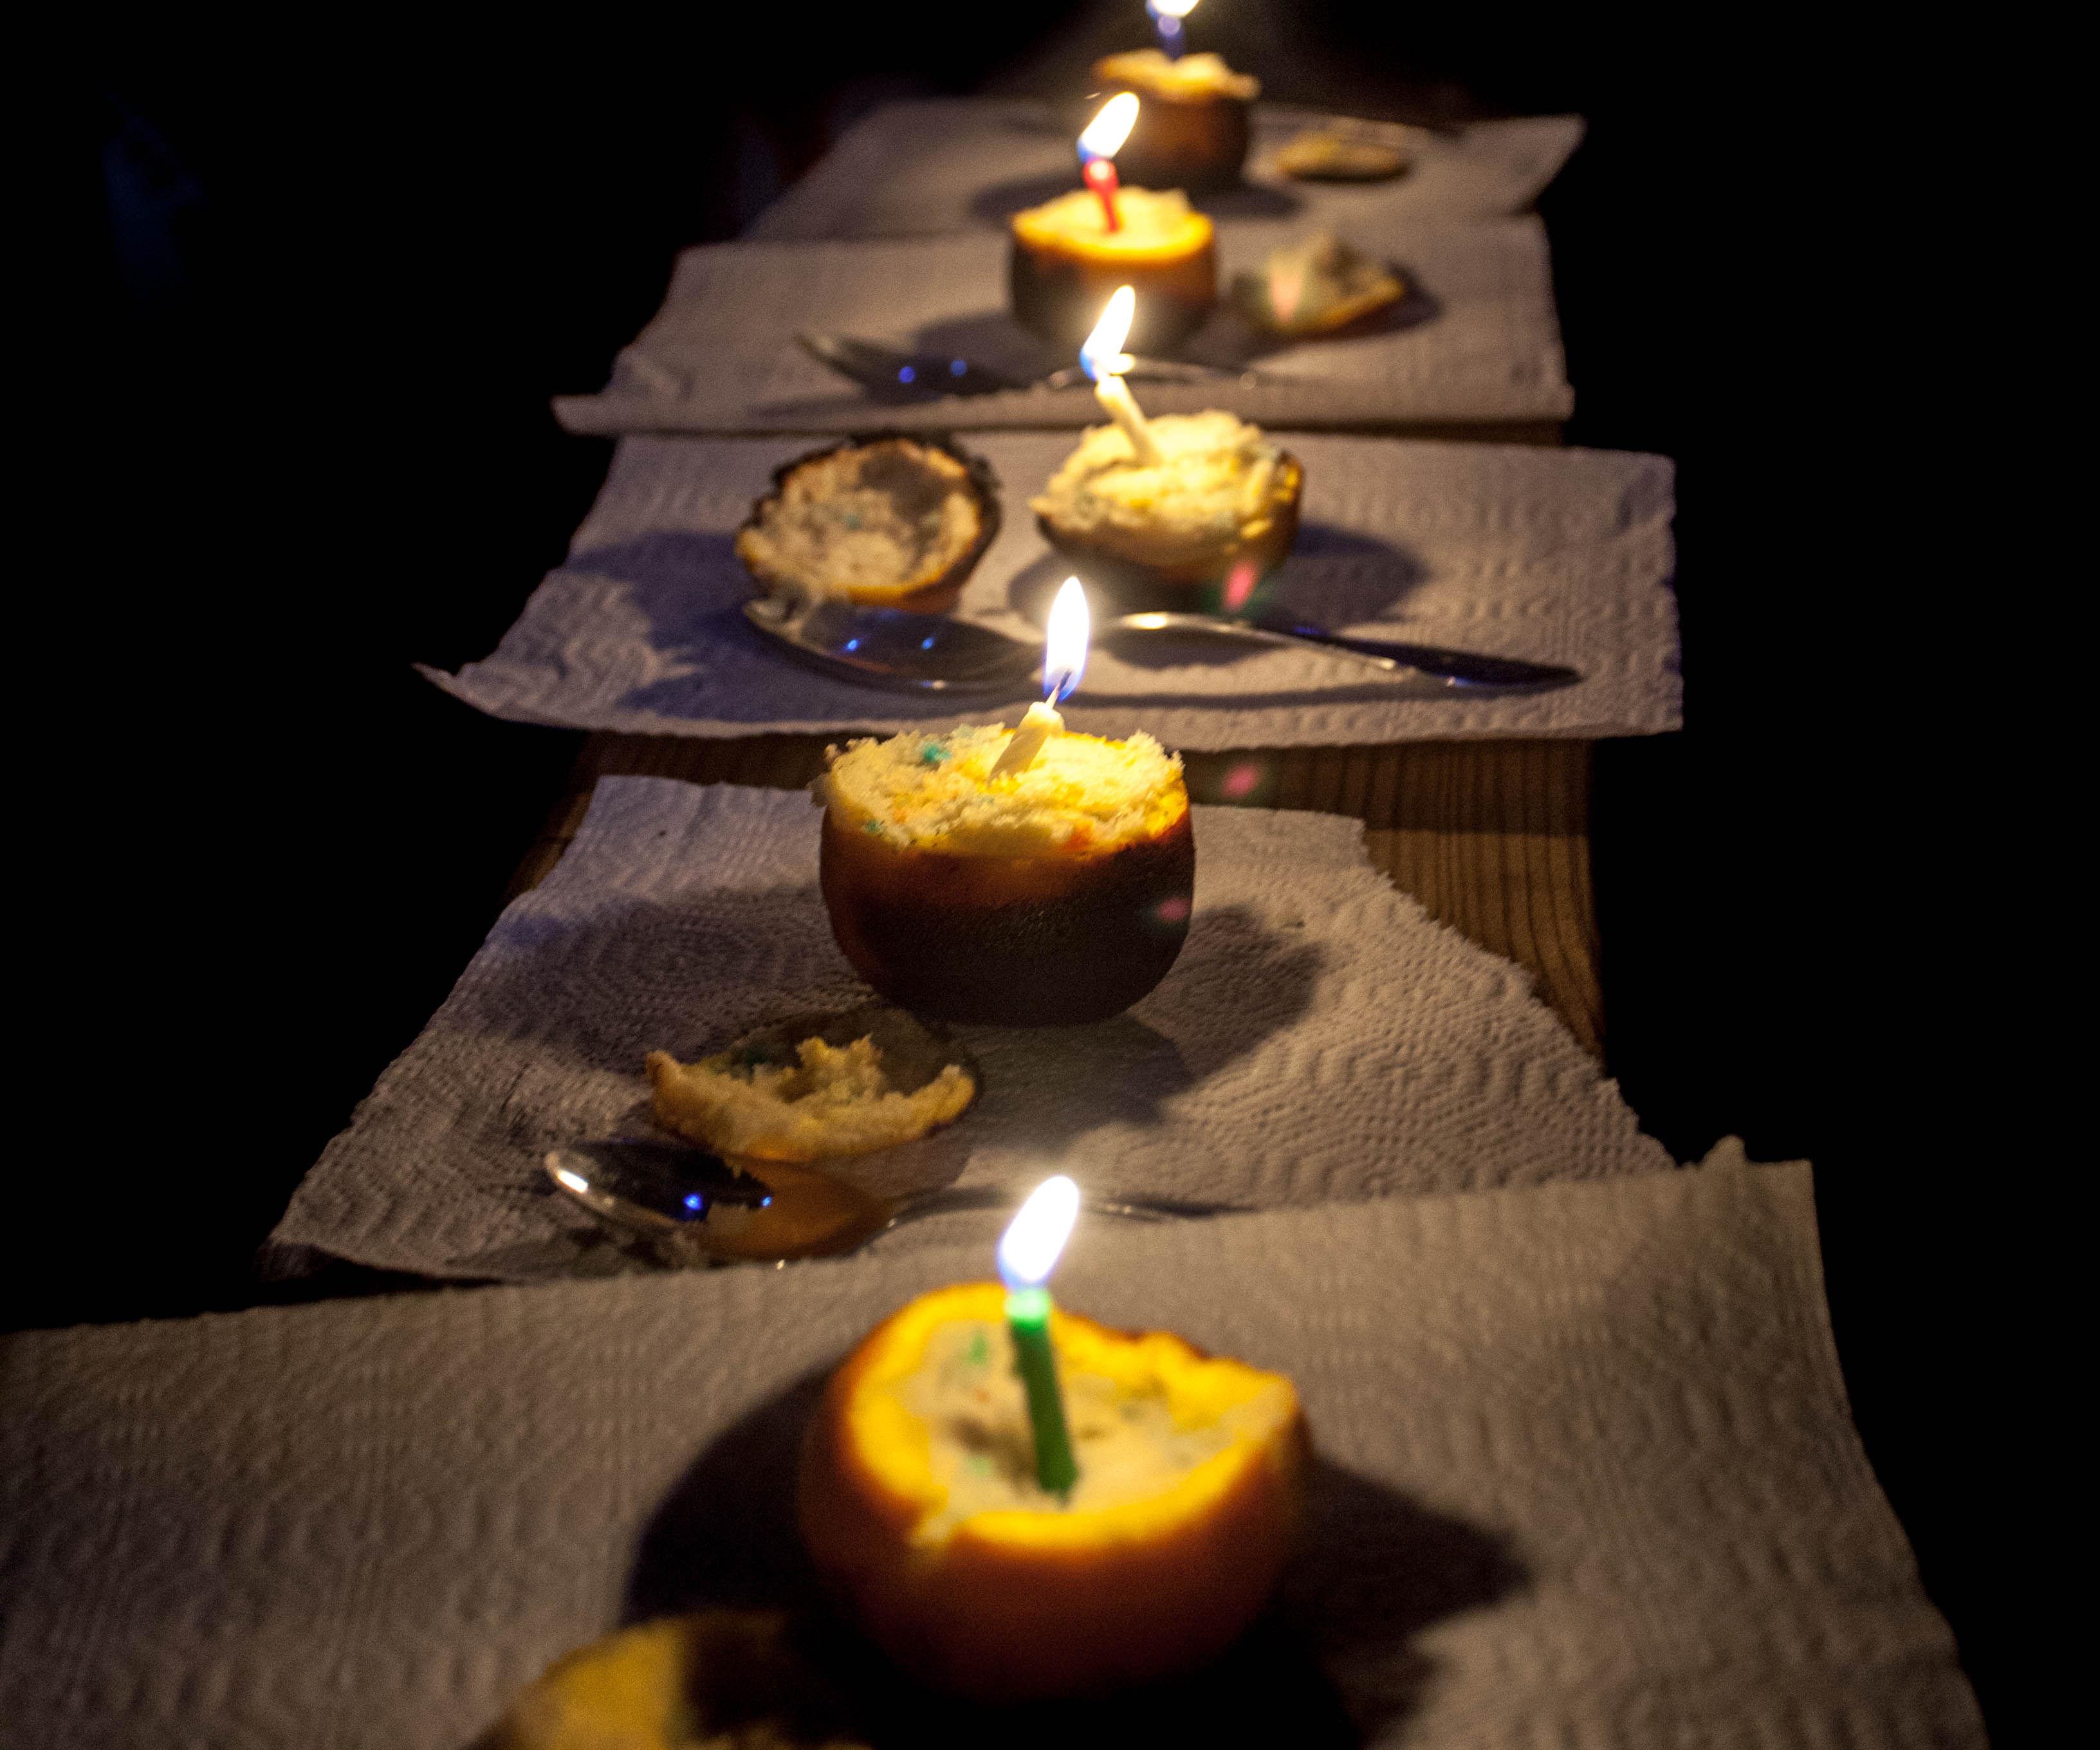 [Campfire Recipes] Bake a Cake in an Orange